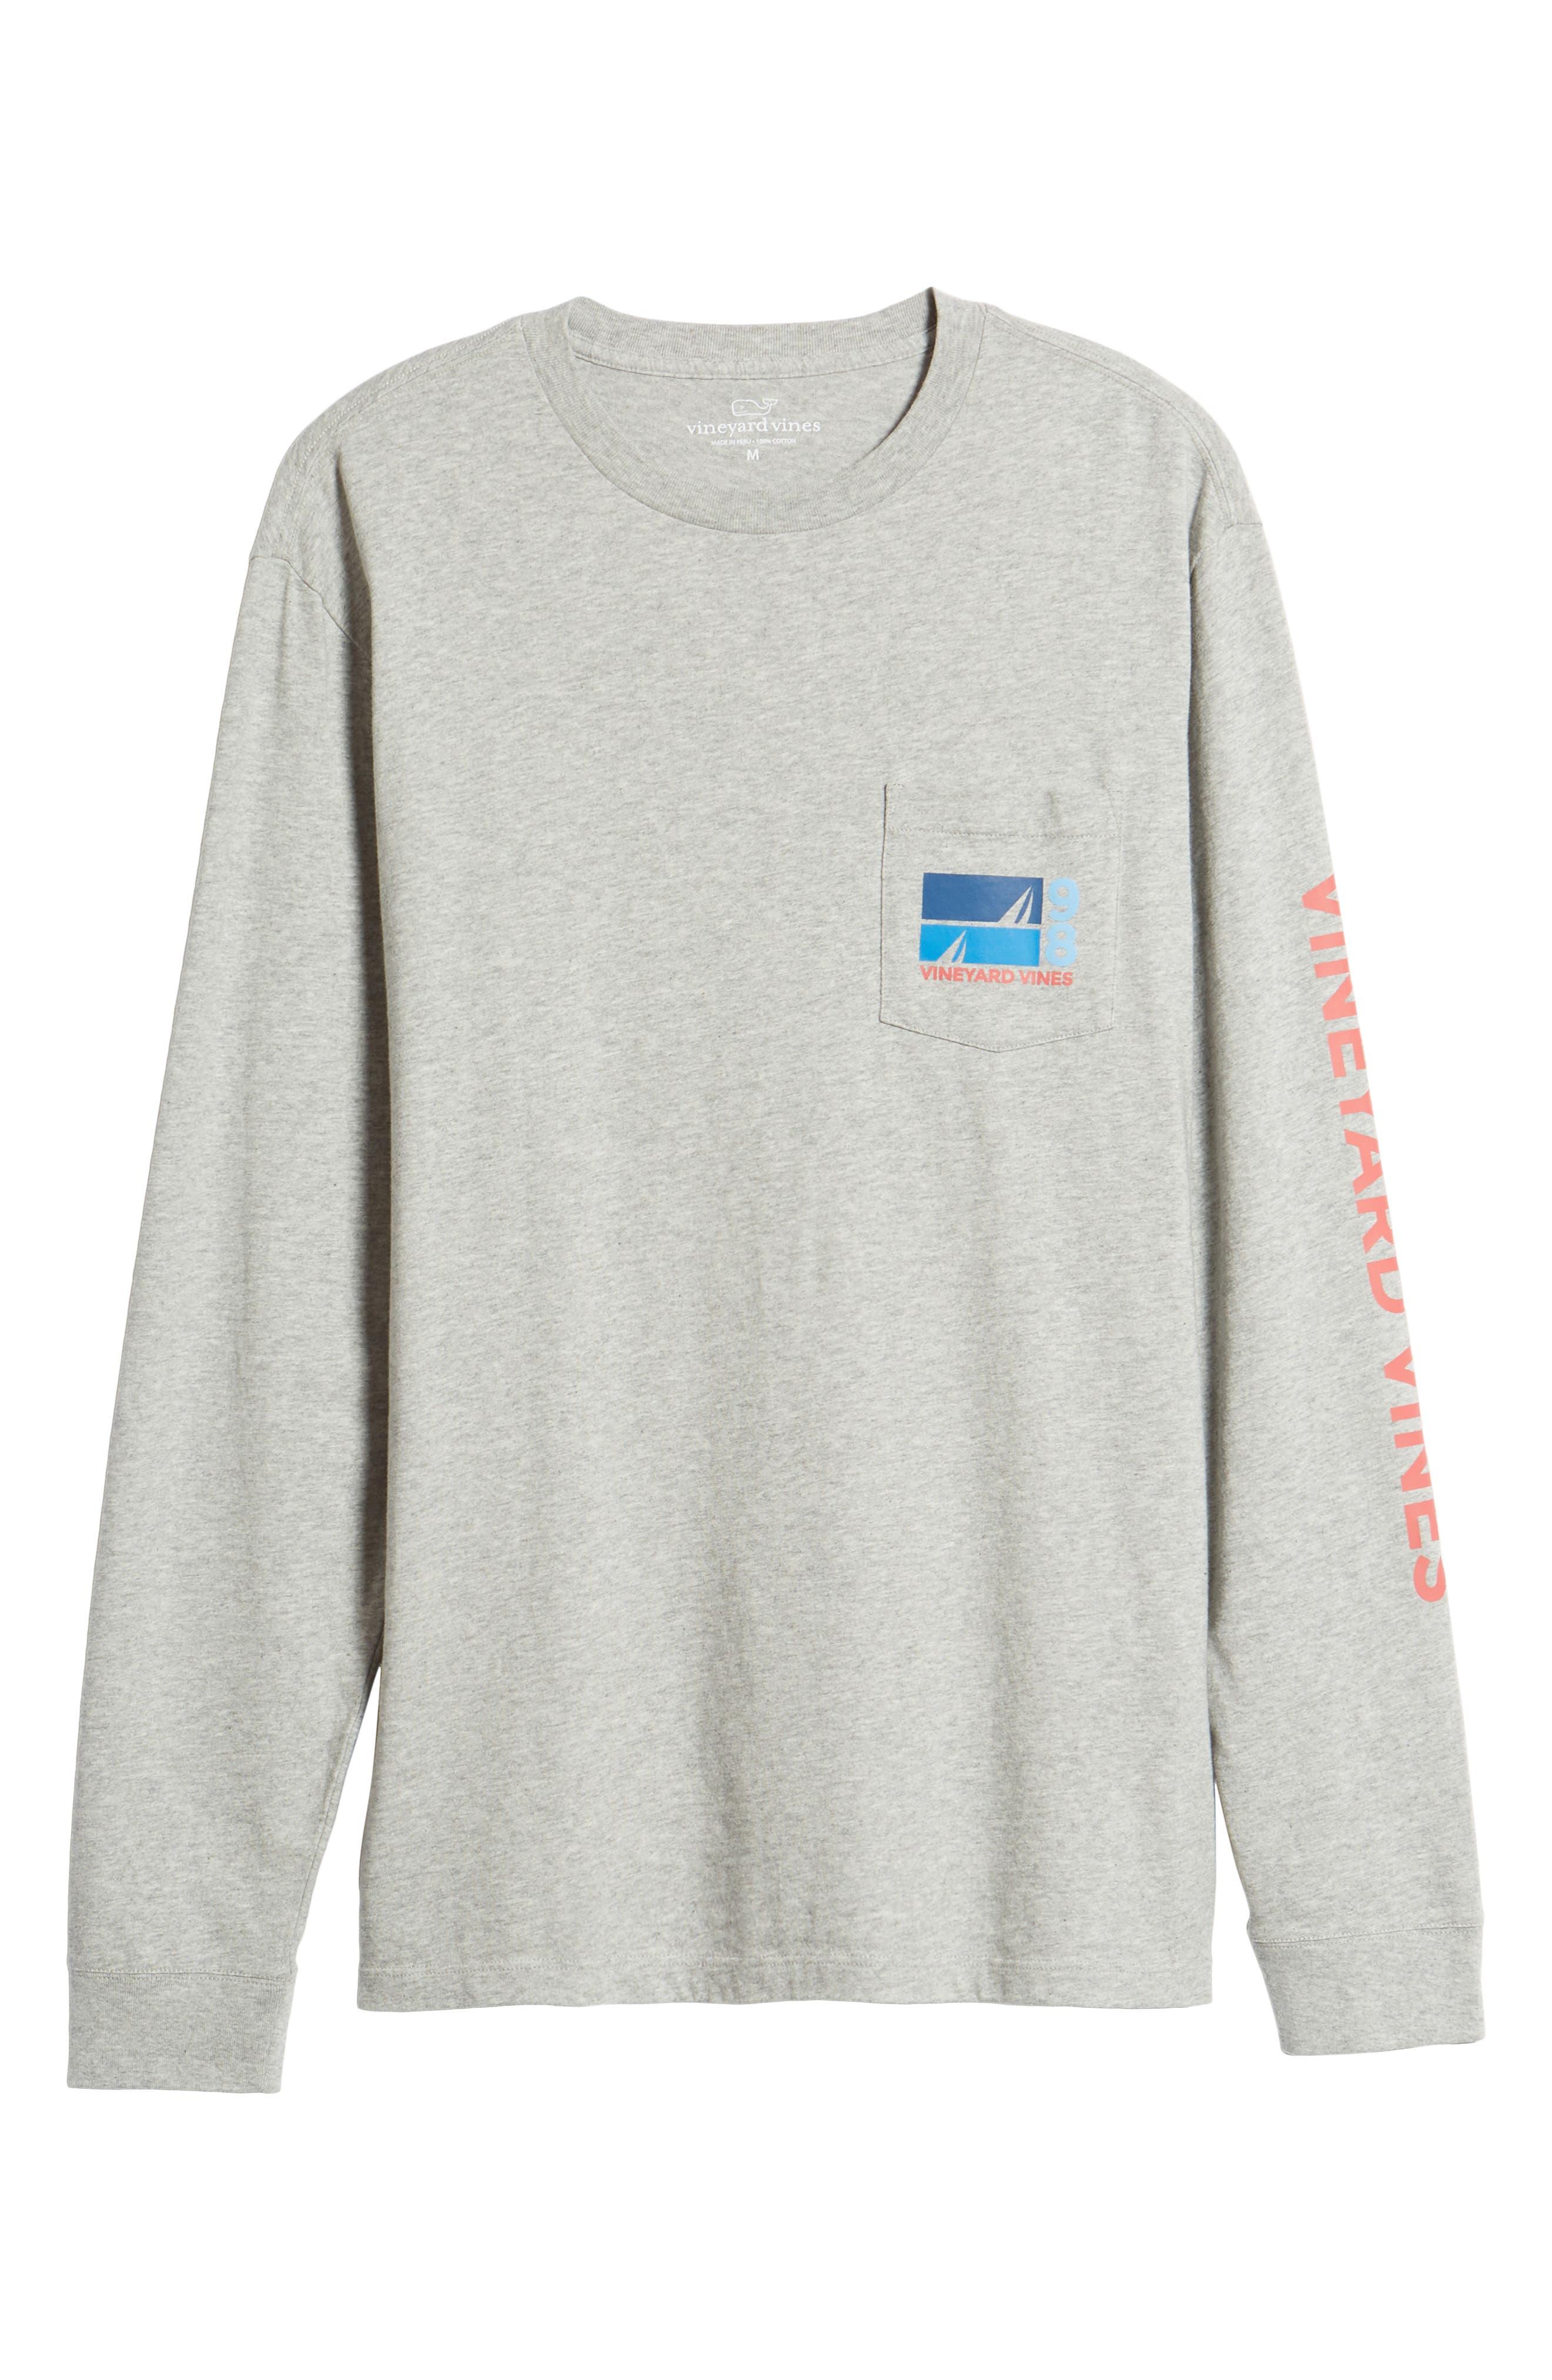 VINEYARD VINES,                             Sailing Blue Regular Fit Crewneck T-Shirt,                             Alternate thumbnail 6, color,                             039